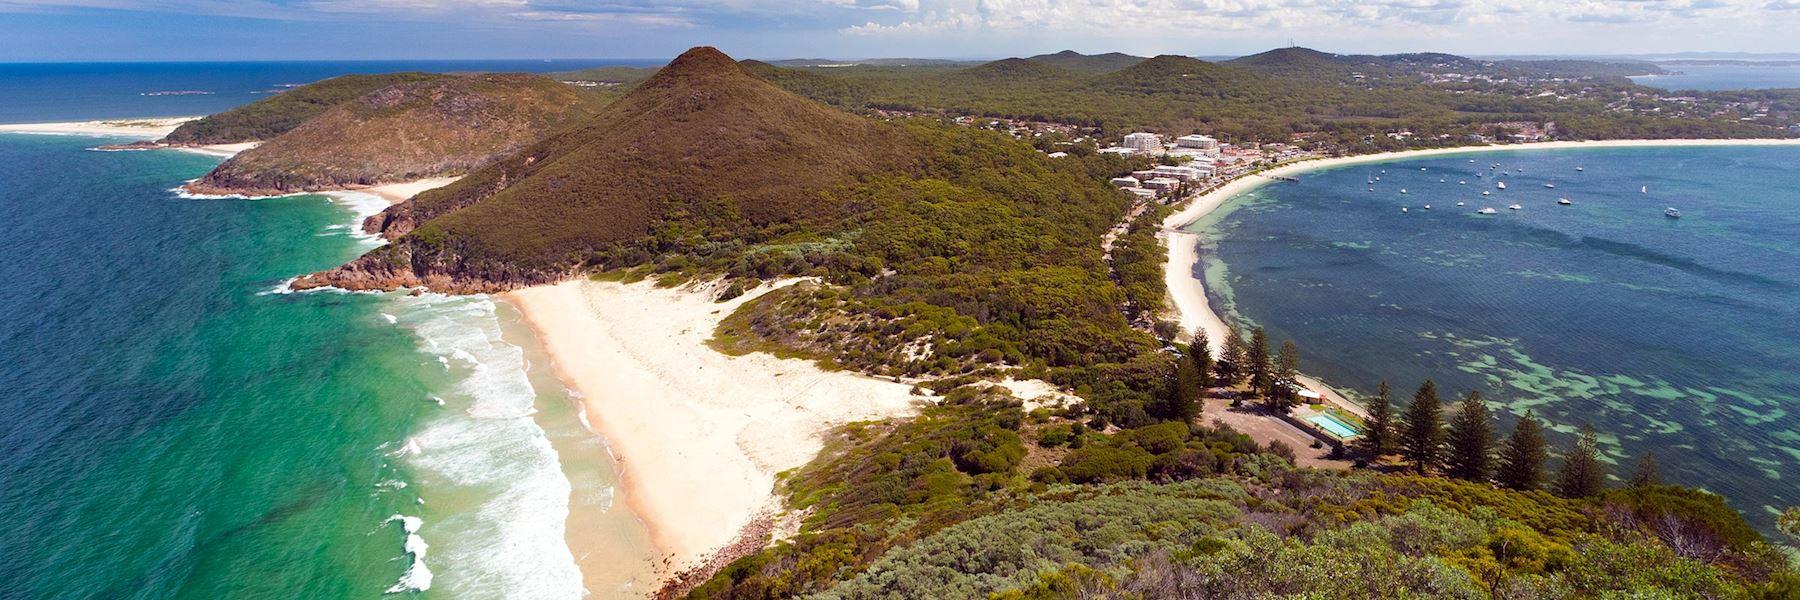 Visit Port Stephens, Australia